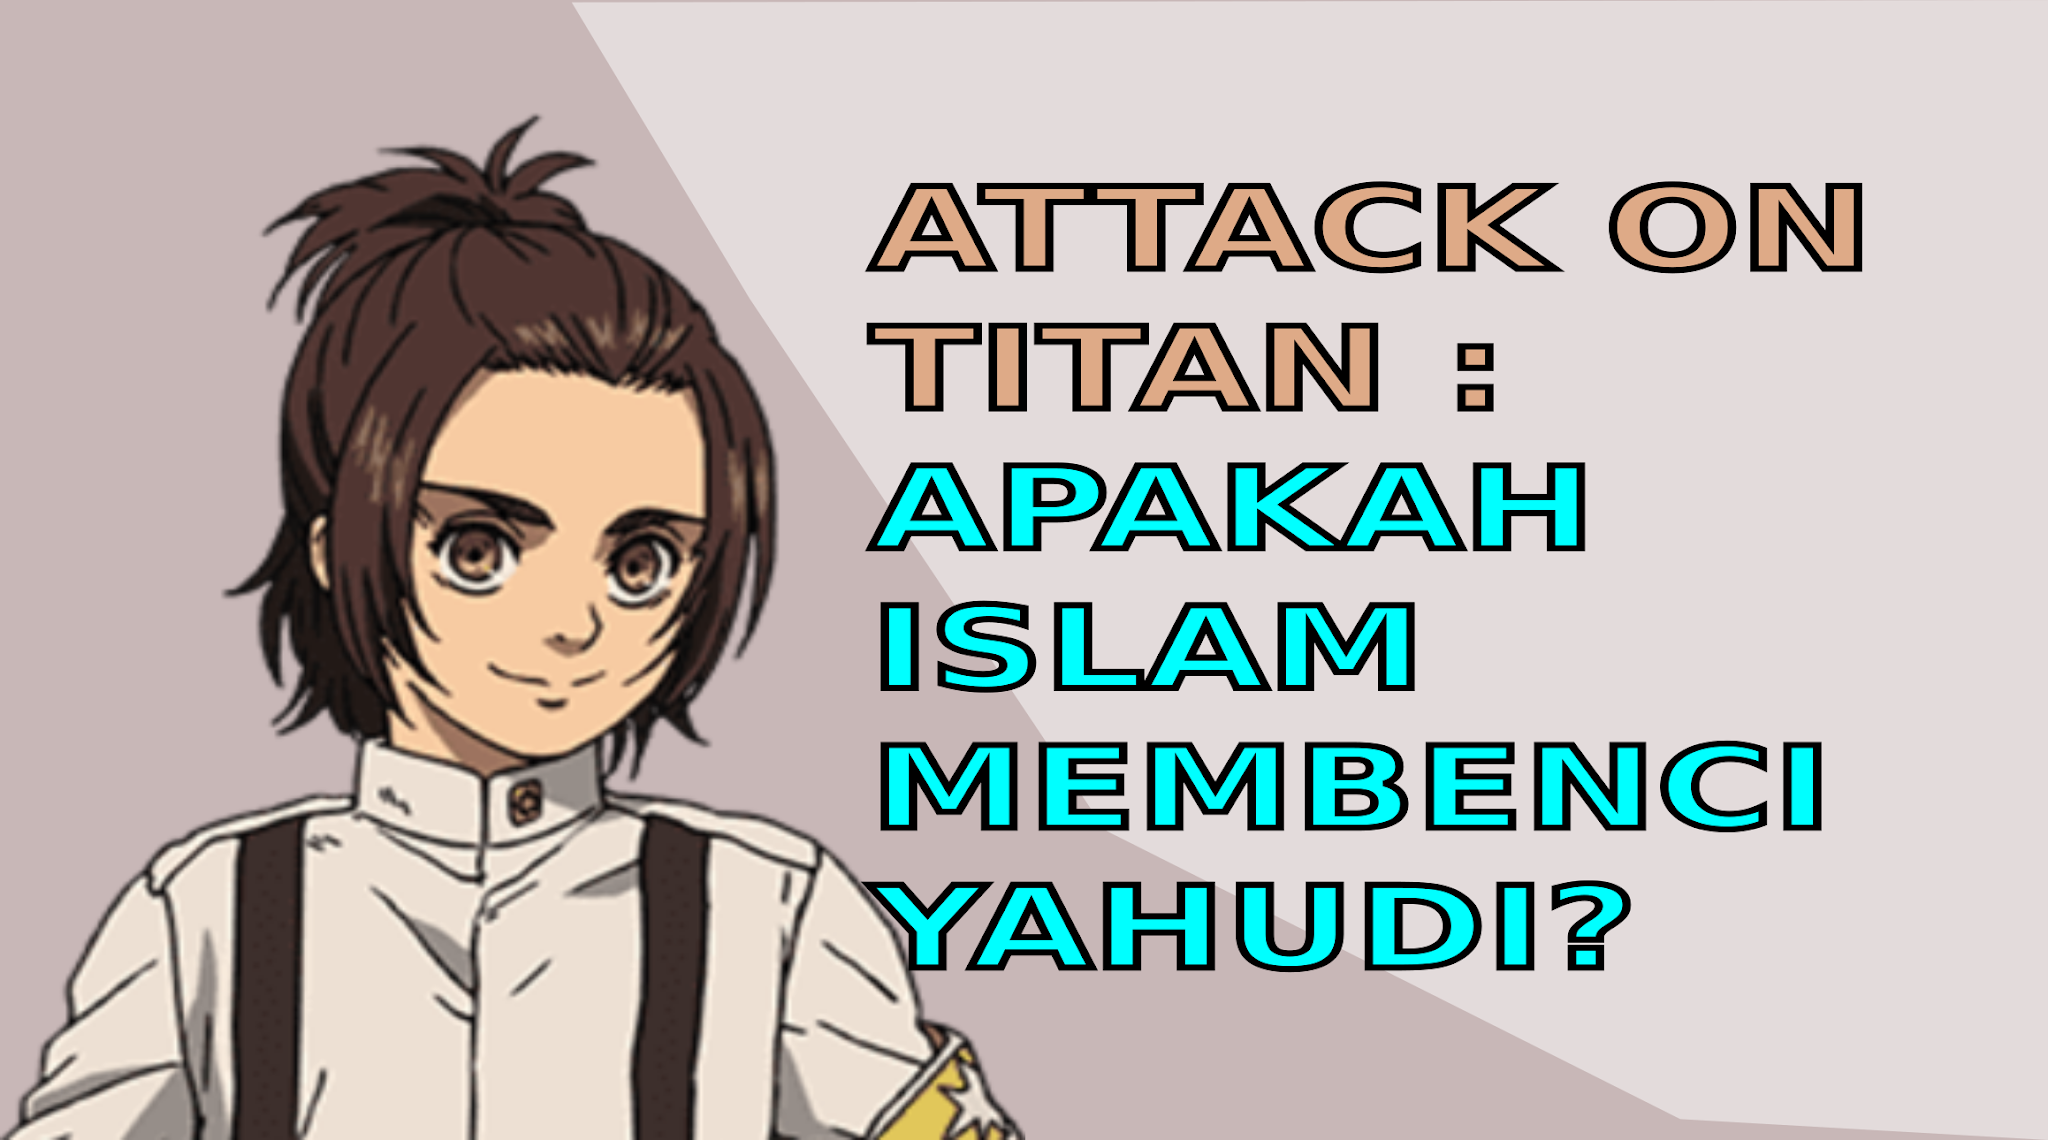 Attack On Titan Apakah Islam Membenci Yahudi?Review anime Shingeki no Kyojin episode 70 final season 4